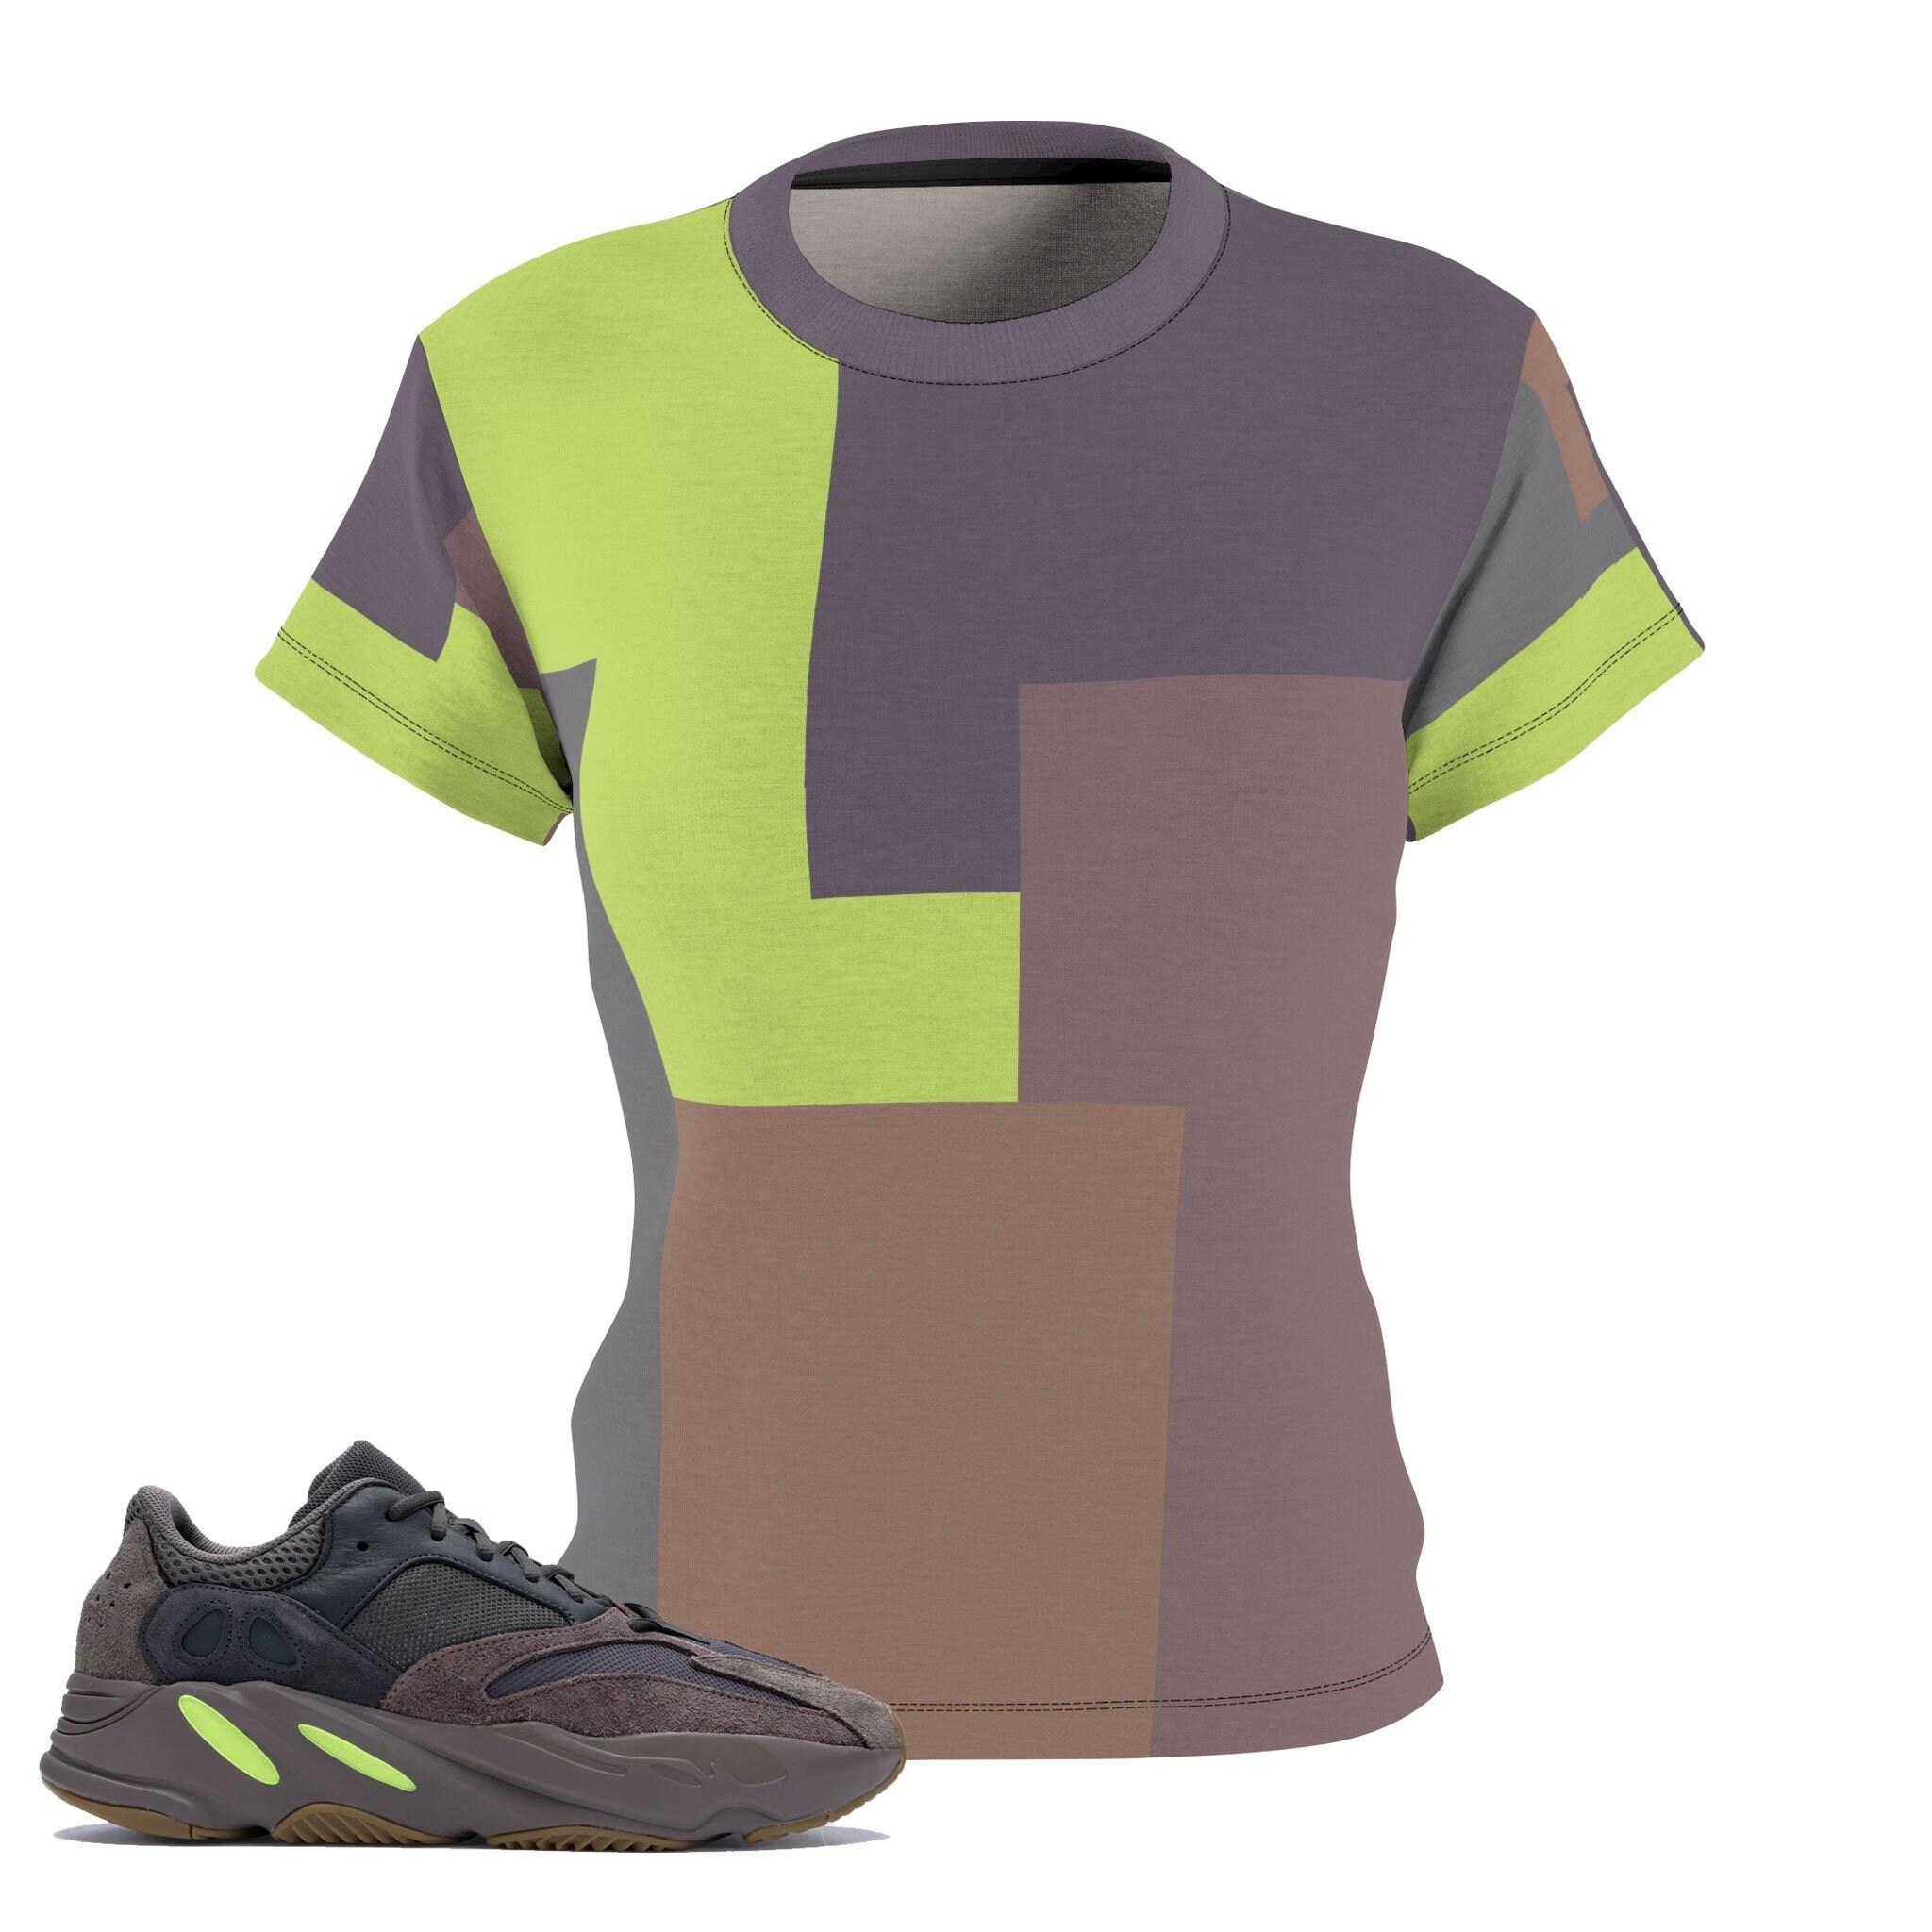 factory price e38fe bb12c Women s Yeezy Boost 700 Mauve T-Shirt Mauve Yeezy Shirt   Etsy